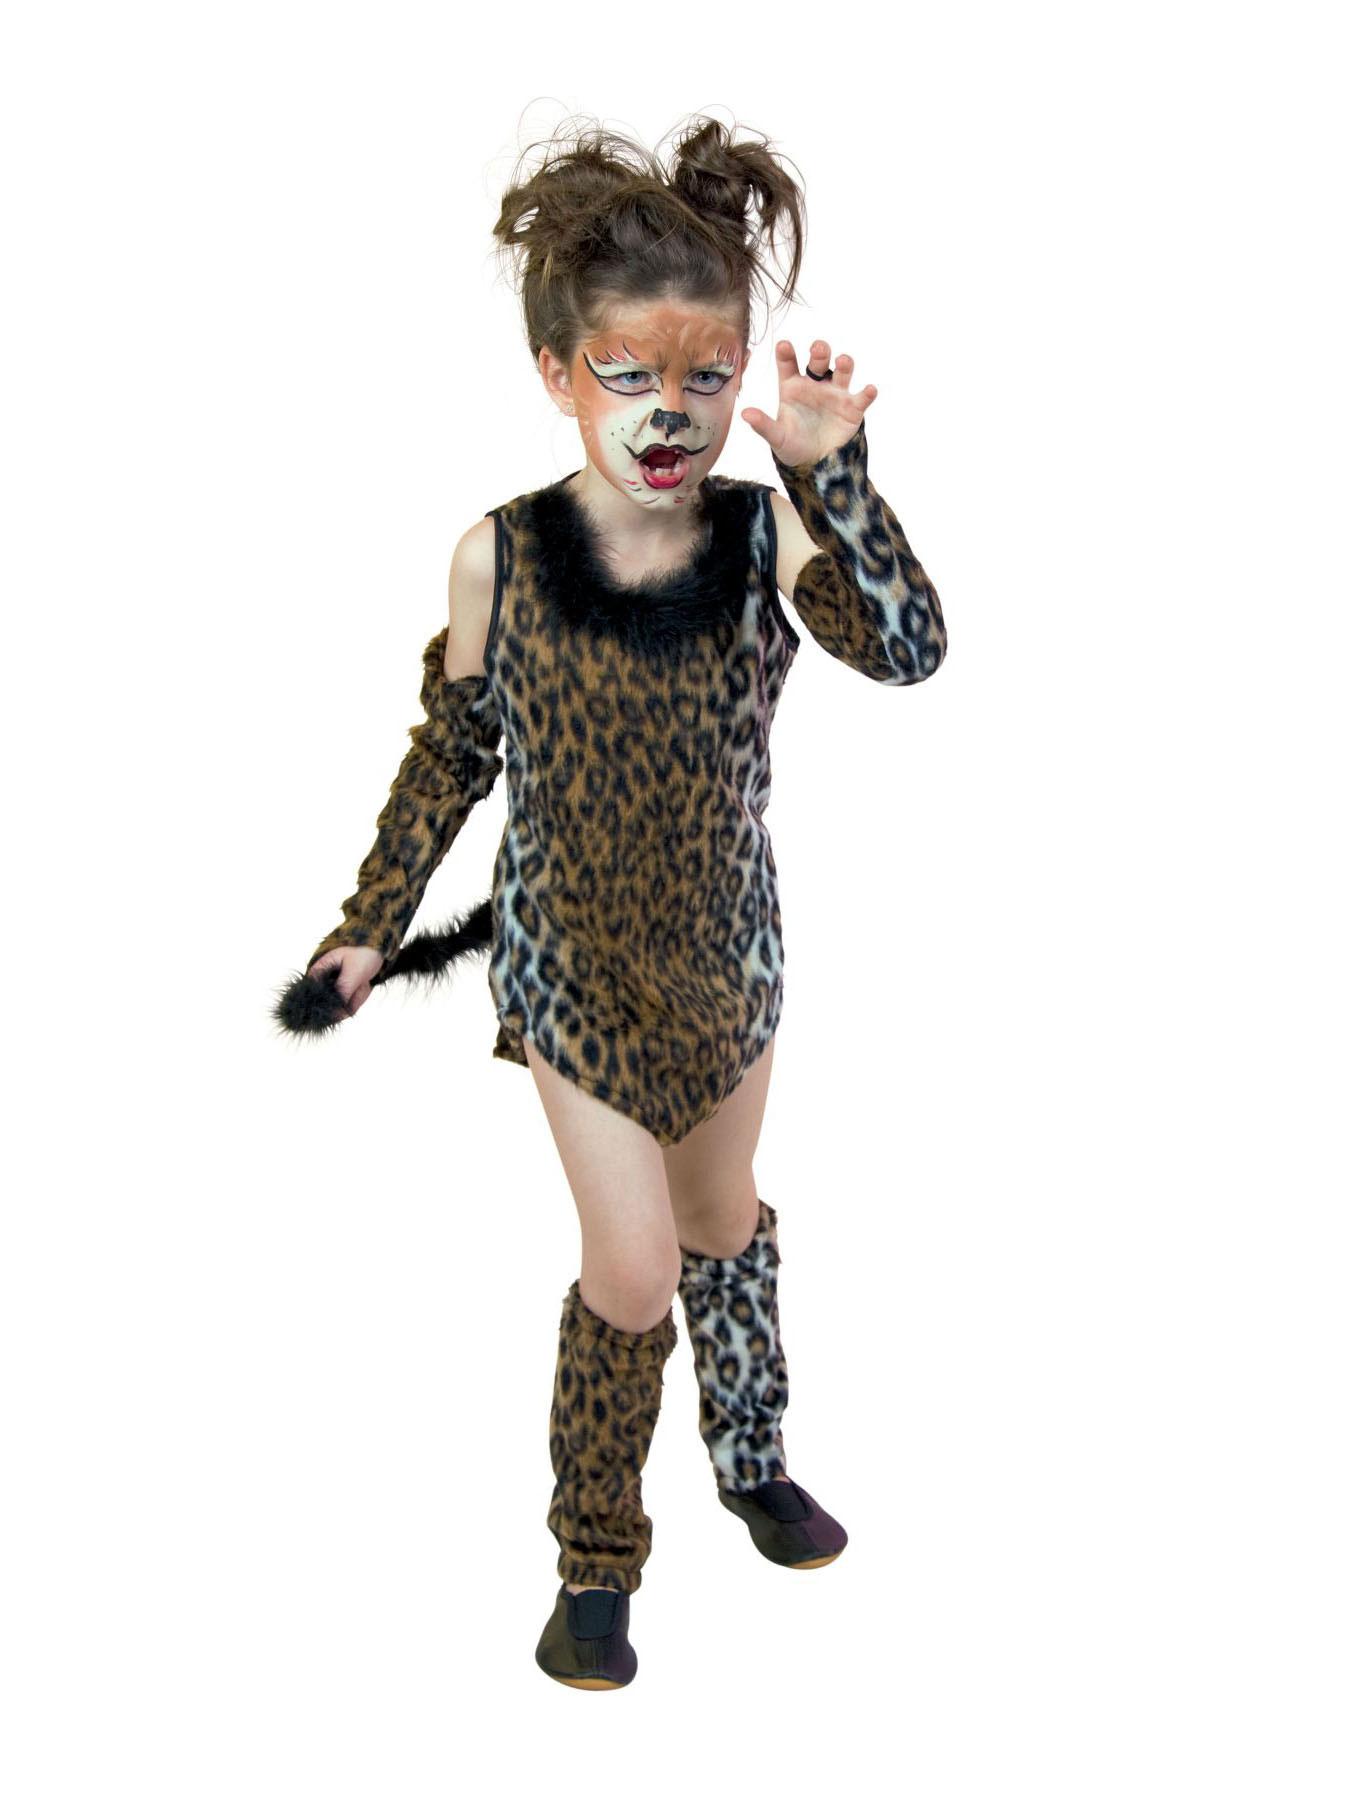 Katze Kinderkostum Fasching Kostum Kinderkostum Hund Katze Kuh